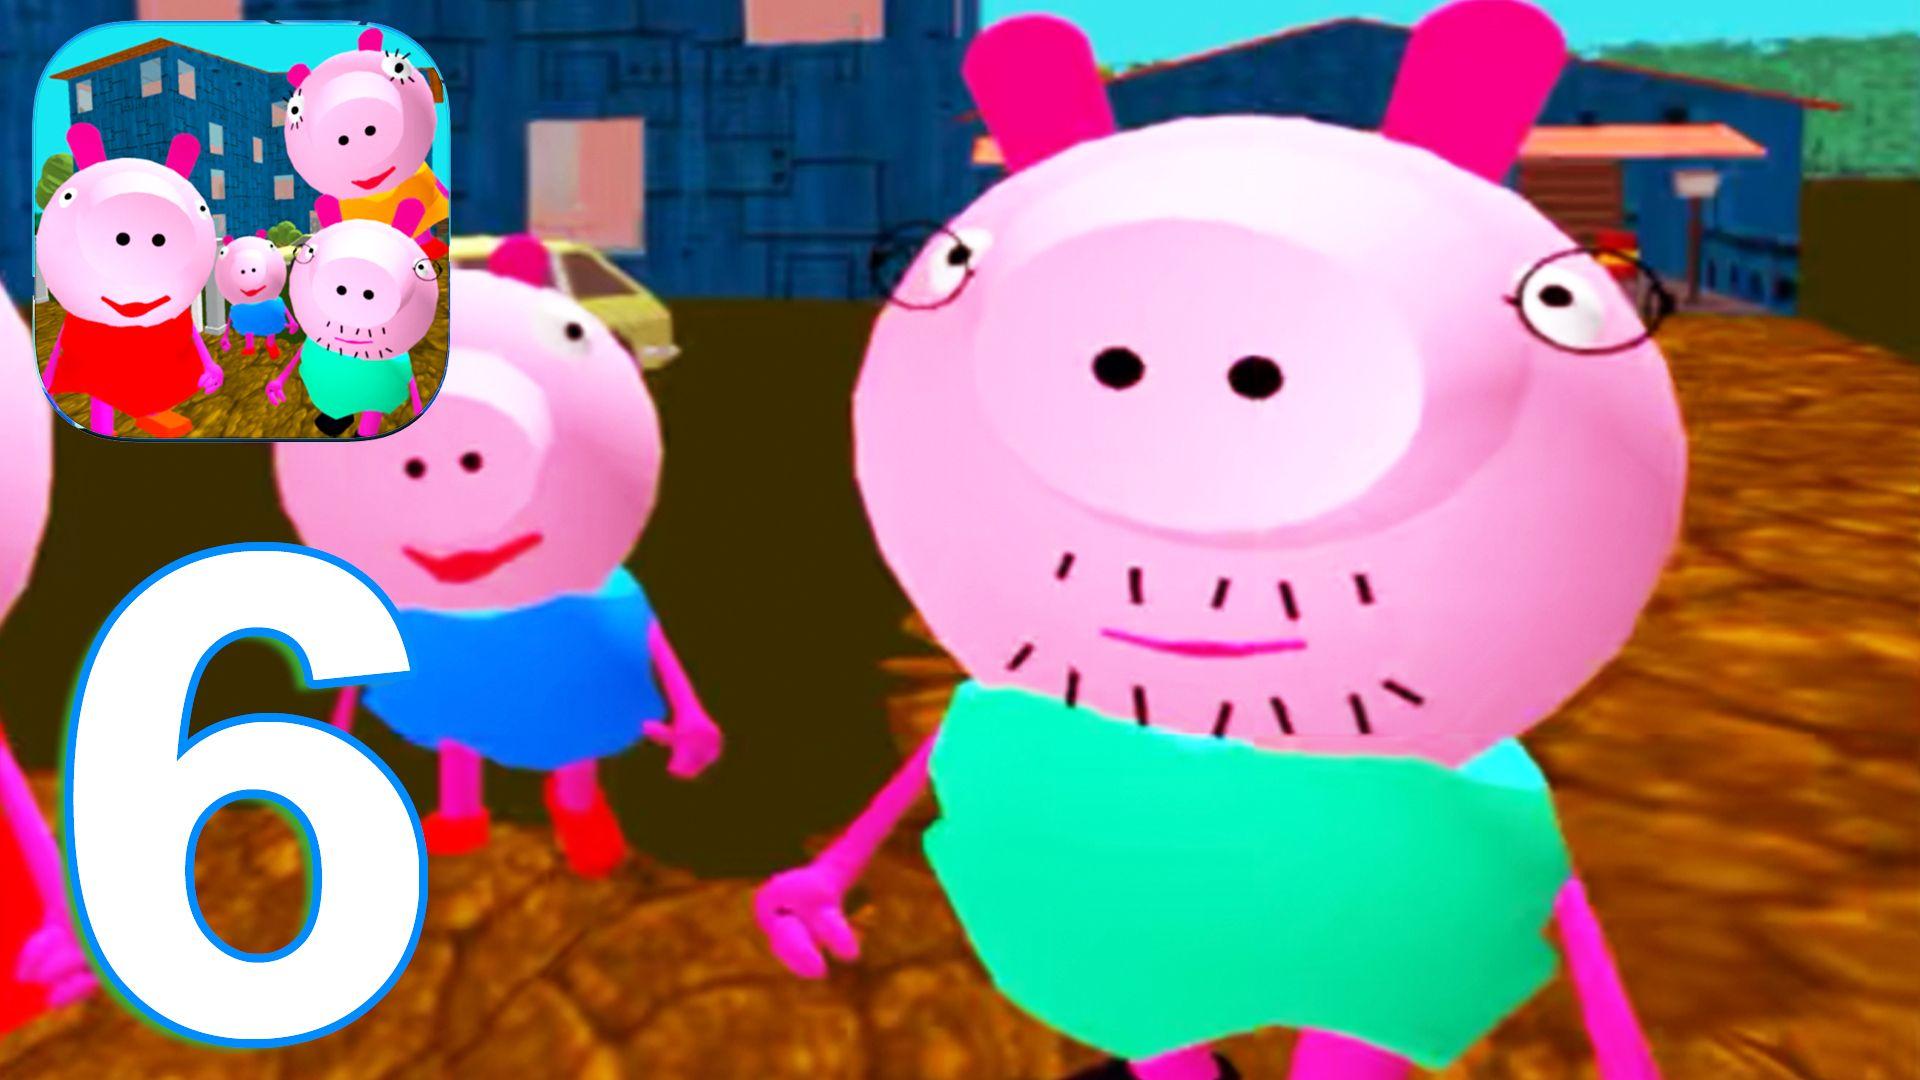 Piggy Neighbor Family Escape Obby House 3d Gameplay Walkthrough Part 6 Level 6 Ios Android Piggy Gameplay Minions